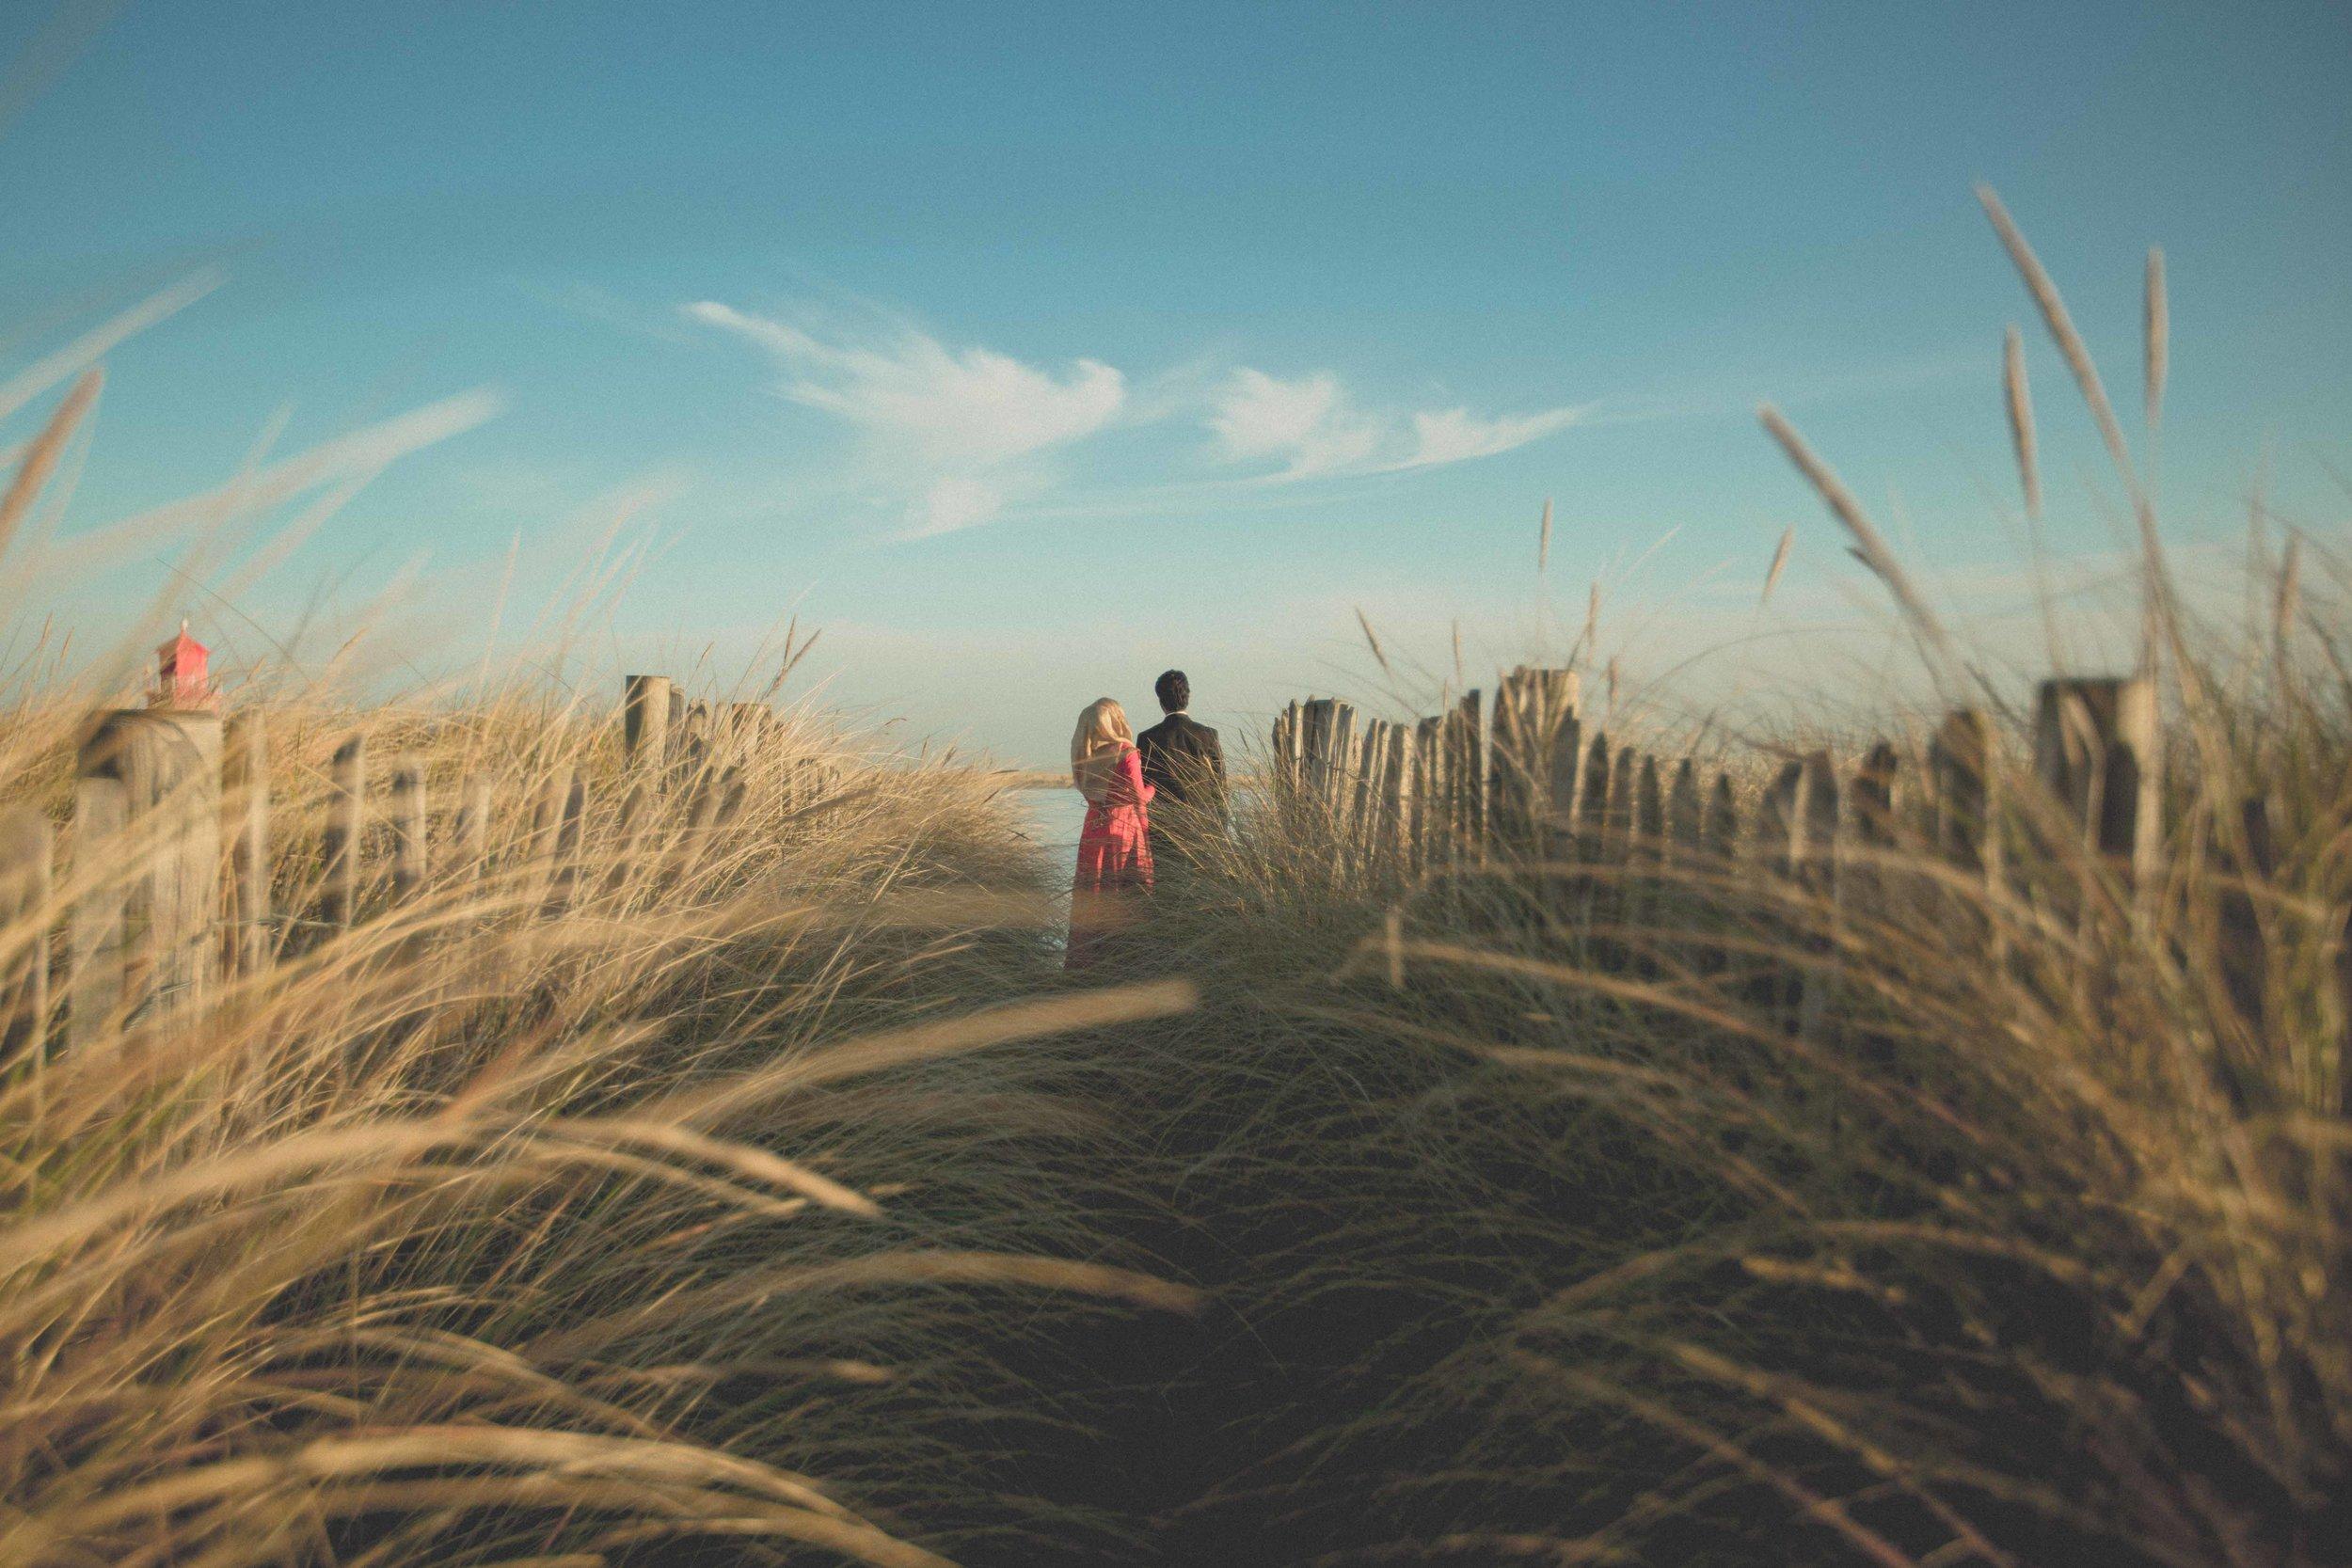 newcastle-beach-lighthouse-couple-prewedding-pre-wedding-shoot-asian-wedding-photographer-natalia-smith-photography-6.jpg